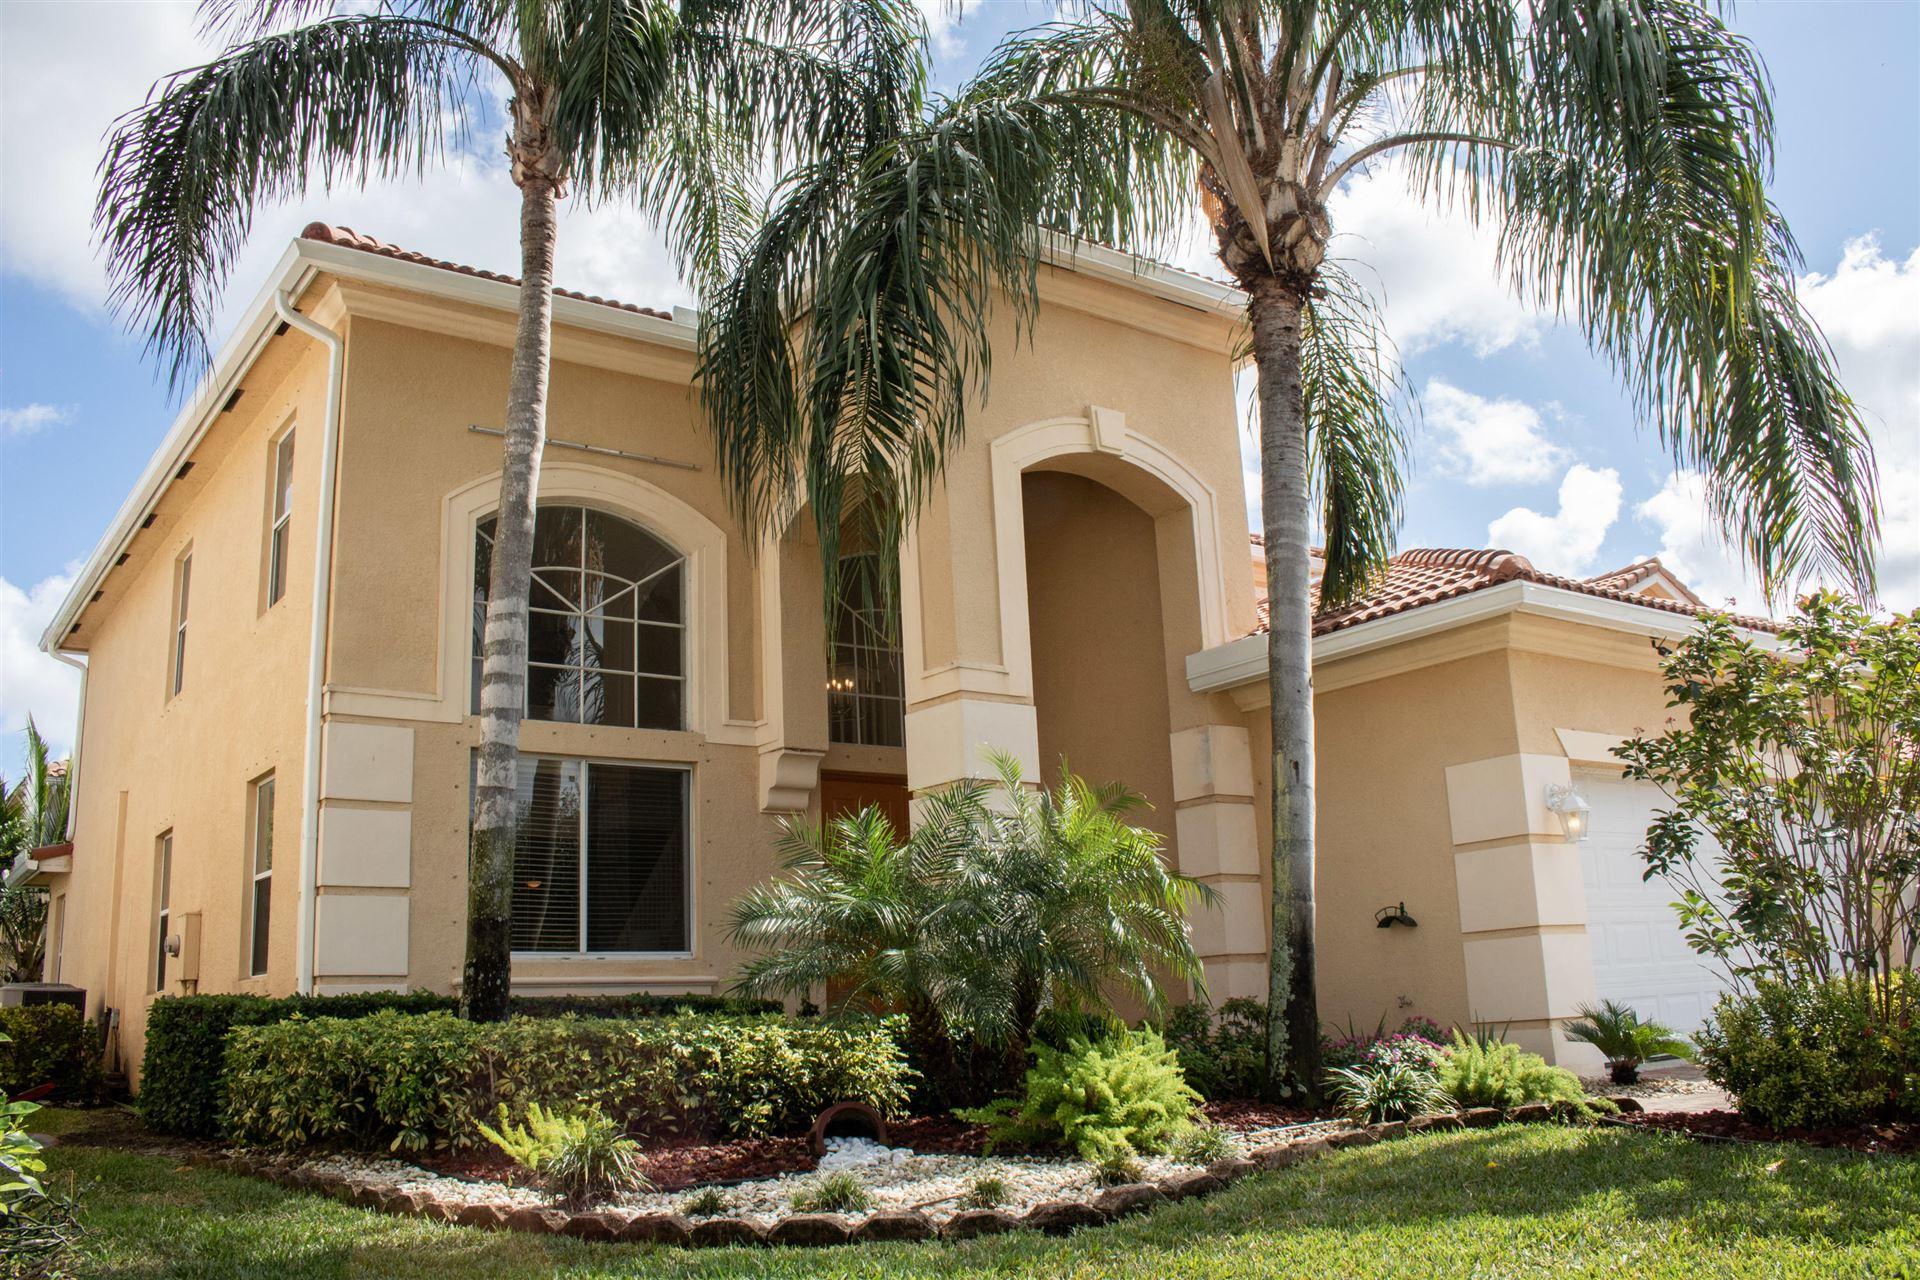 355 Gazetta Way, West Palm Beach, FL 33413 - MLS#: RX-10693090